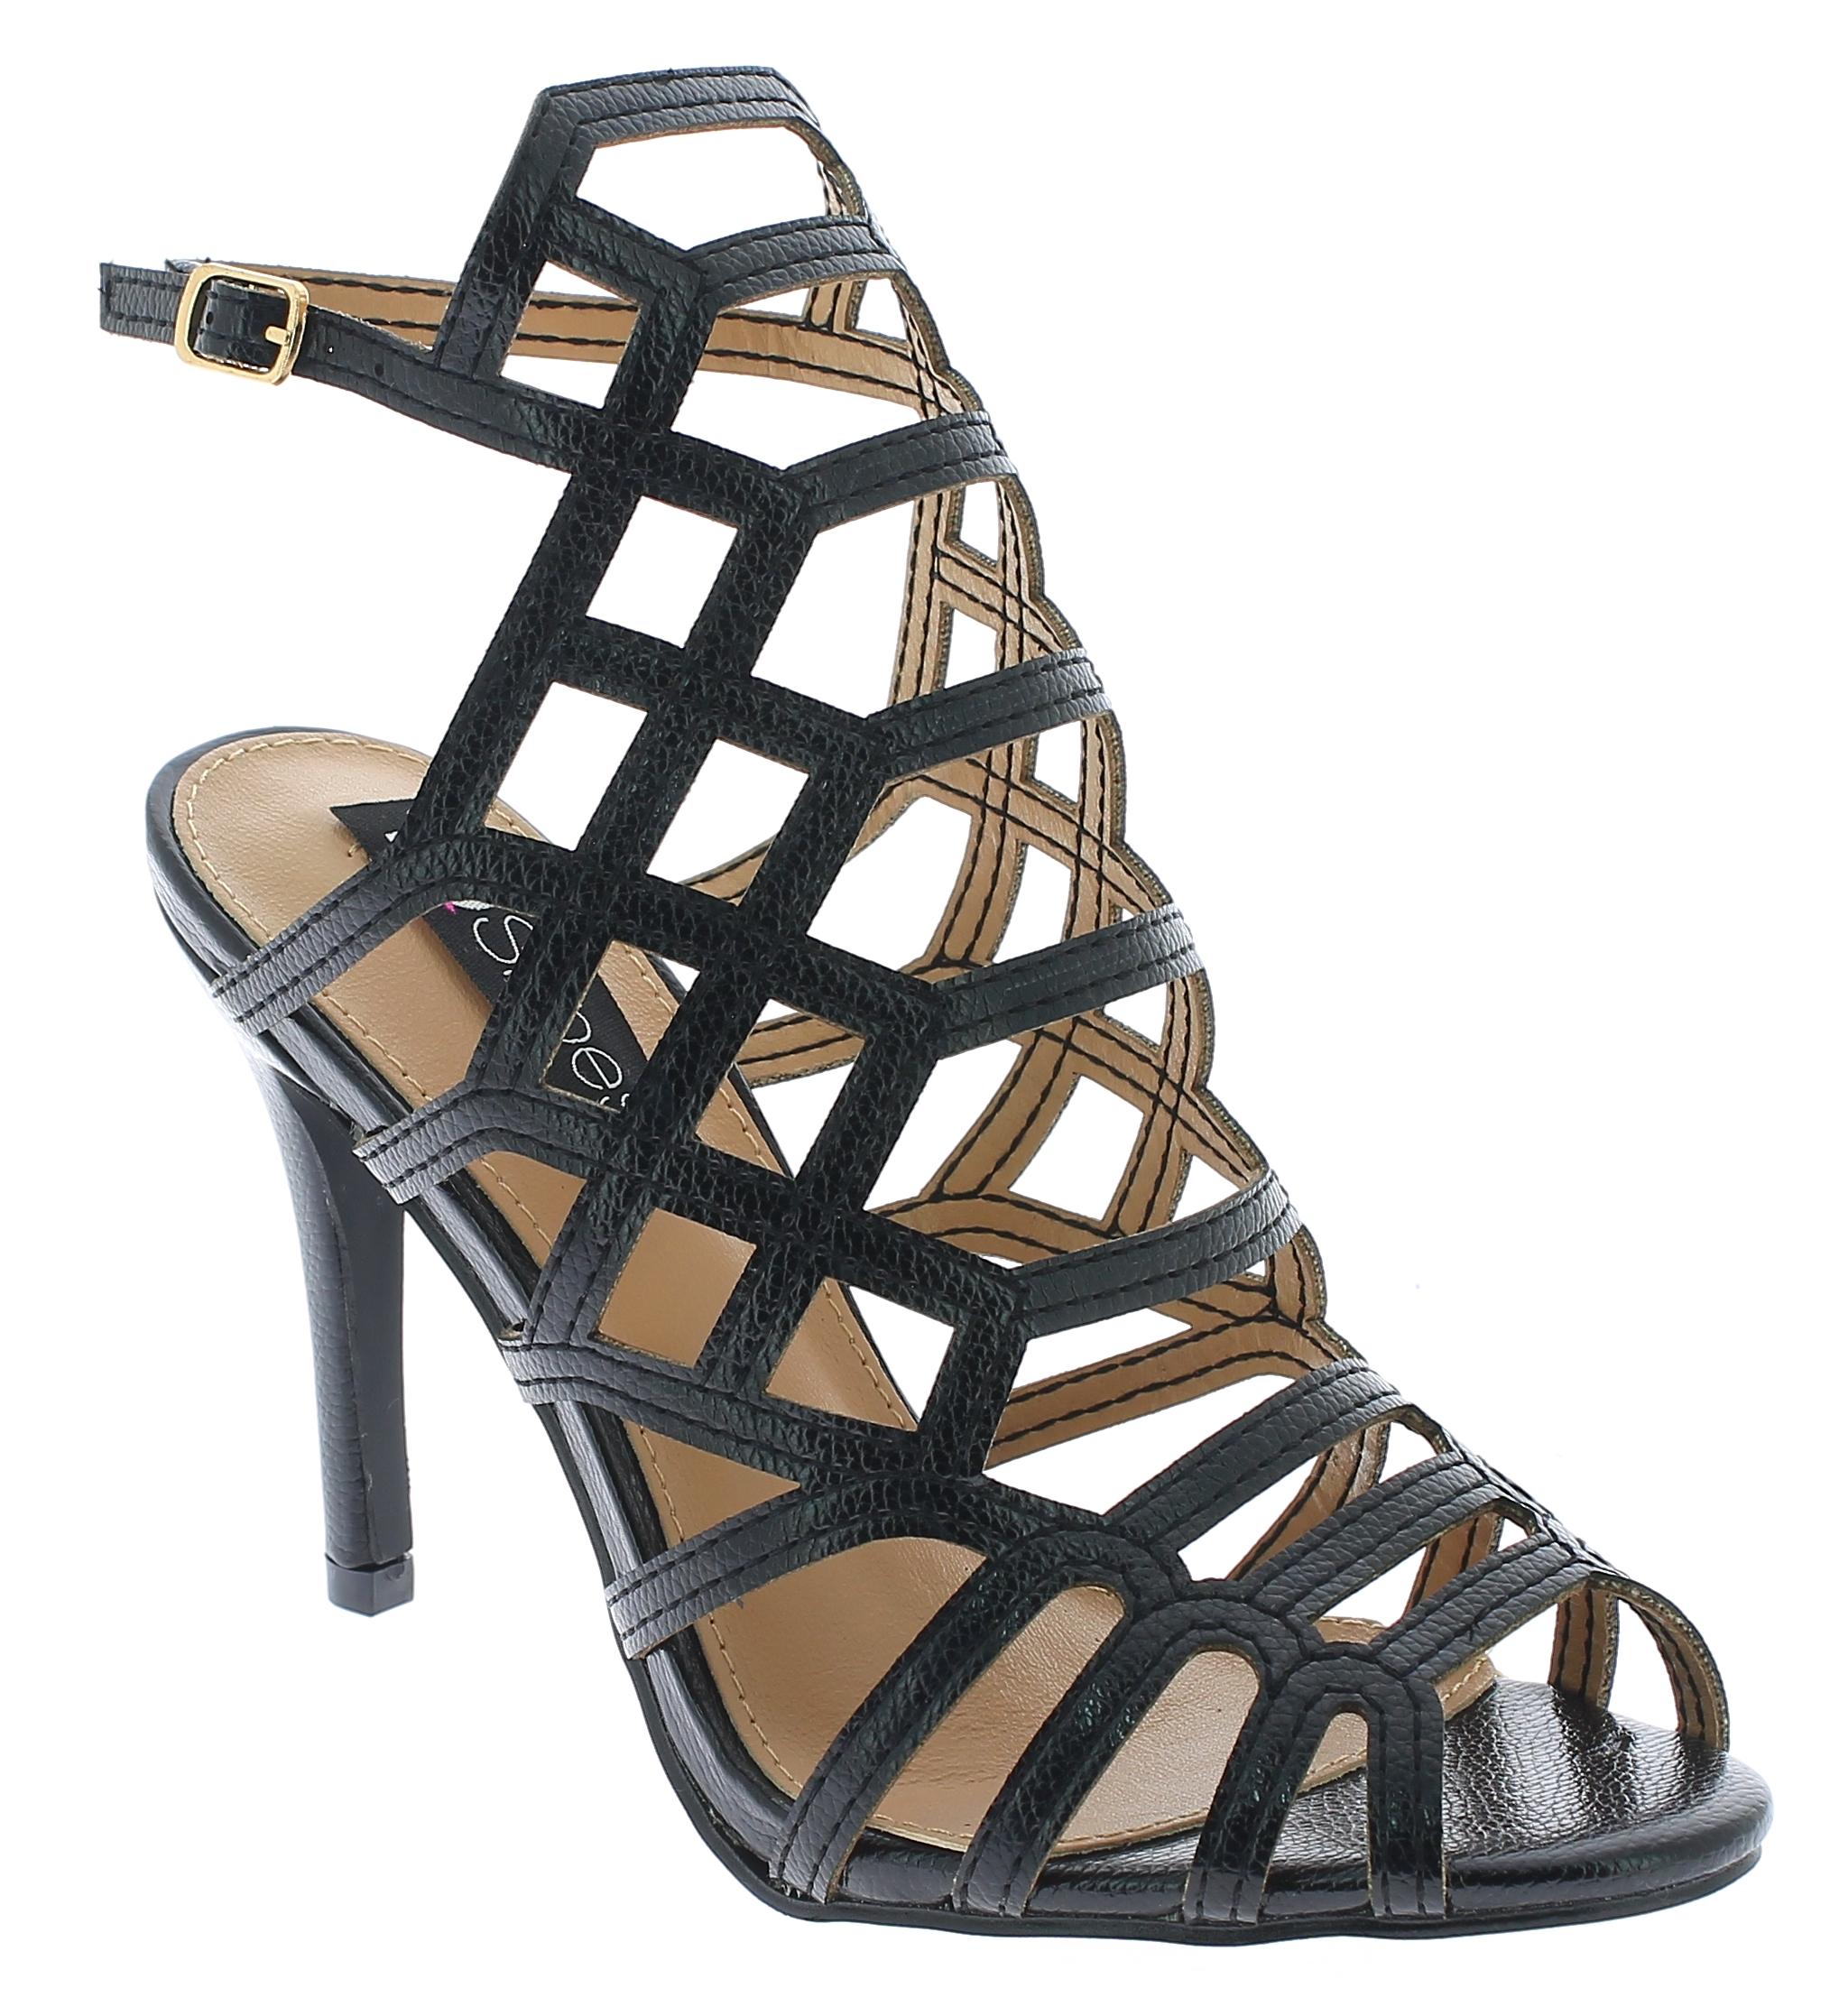 IQSHOES Γυναικείο Πέδιλο 1BL17061 Μαύρο - IqShoes - 1BL17061 BLACK-black-36/1/15 παπούτσια  πέδιλα